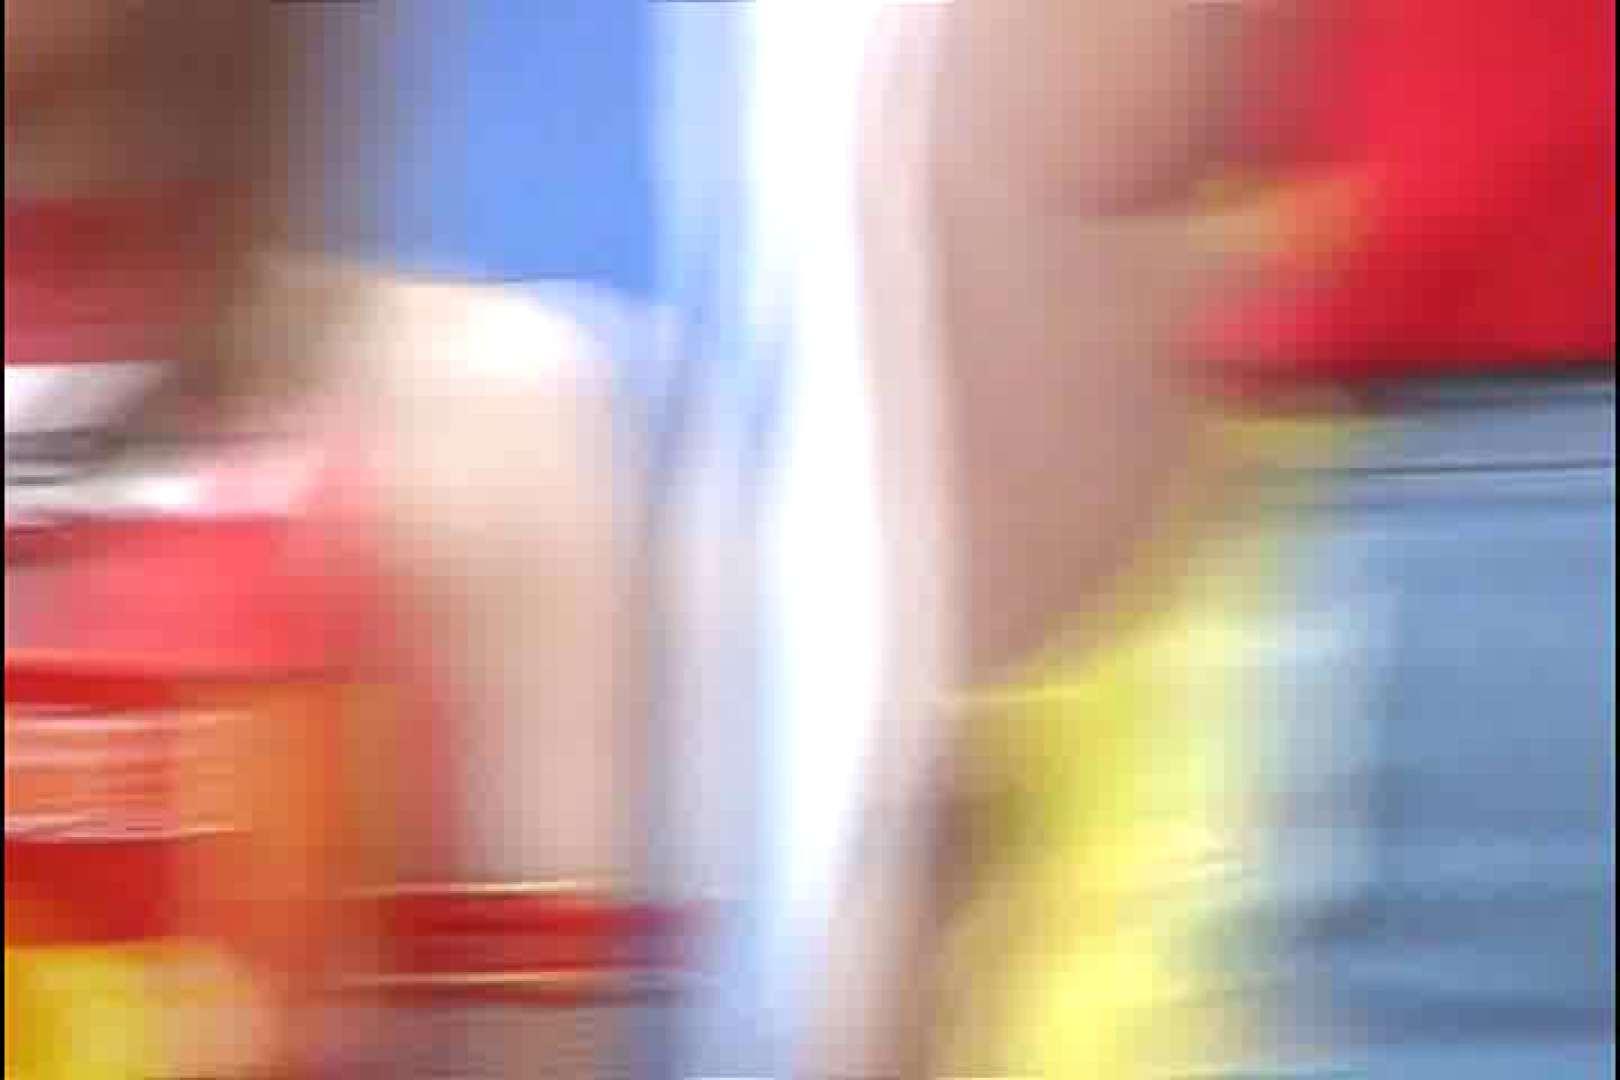 RQカメラ地獄Vol.13 レースクイーン 盗撮おめこ無修正動画無料 95画像 44